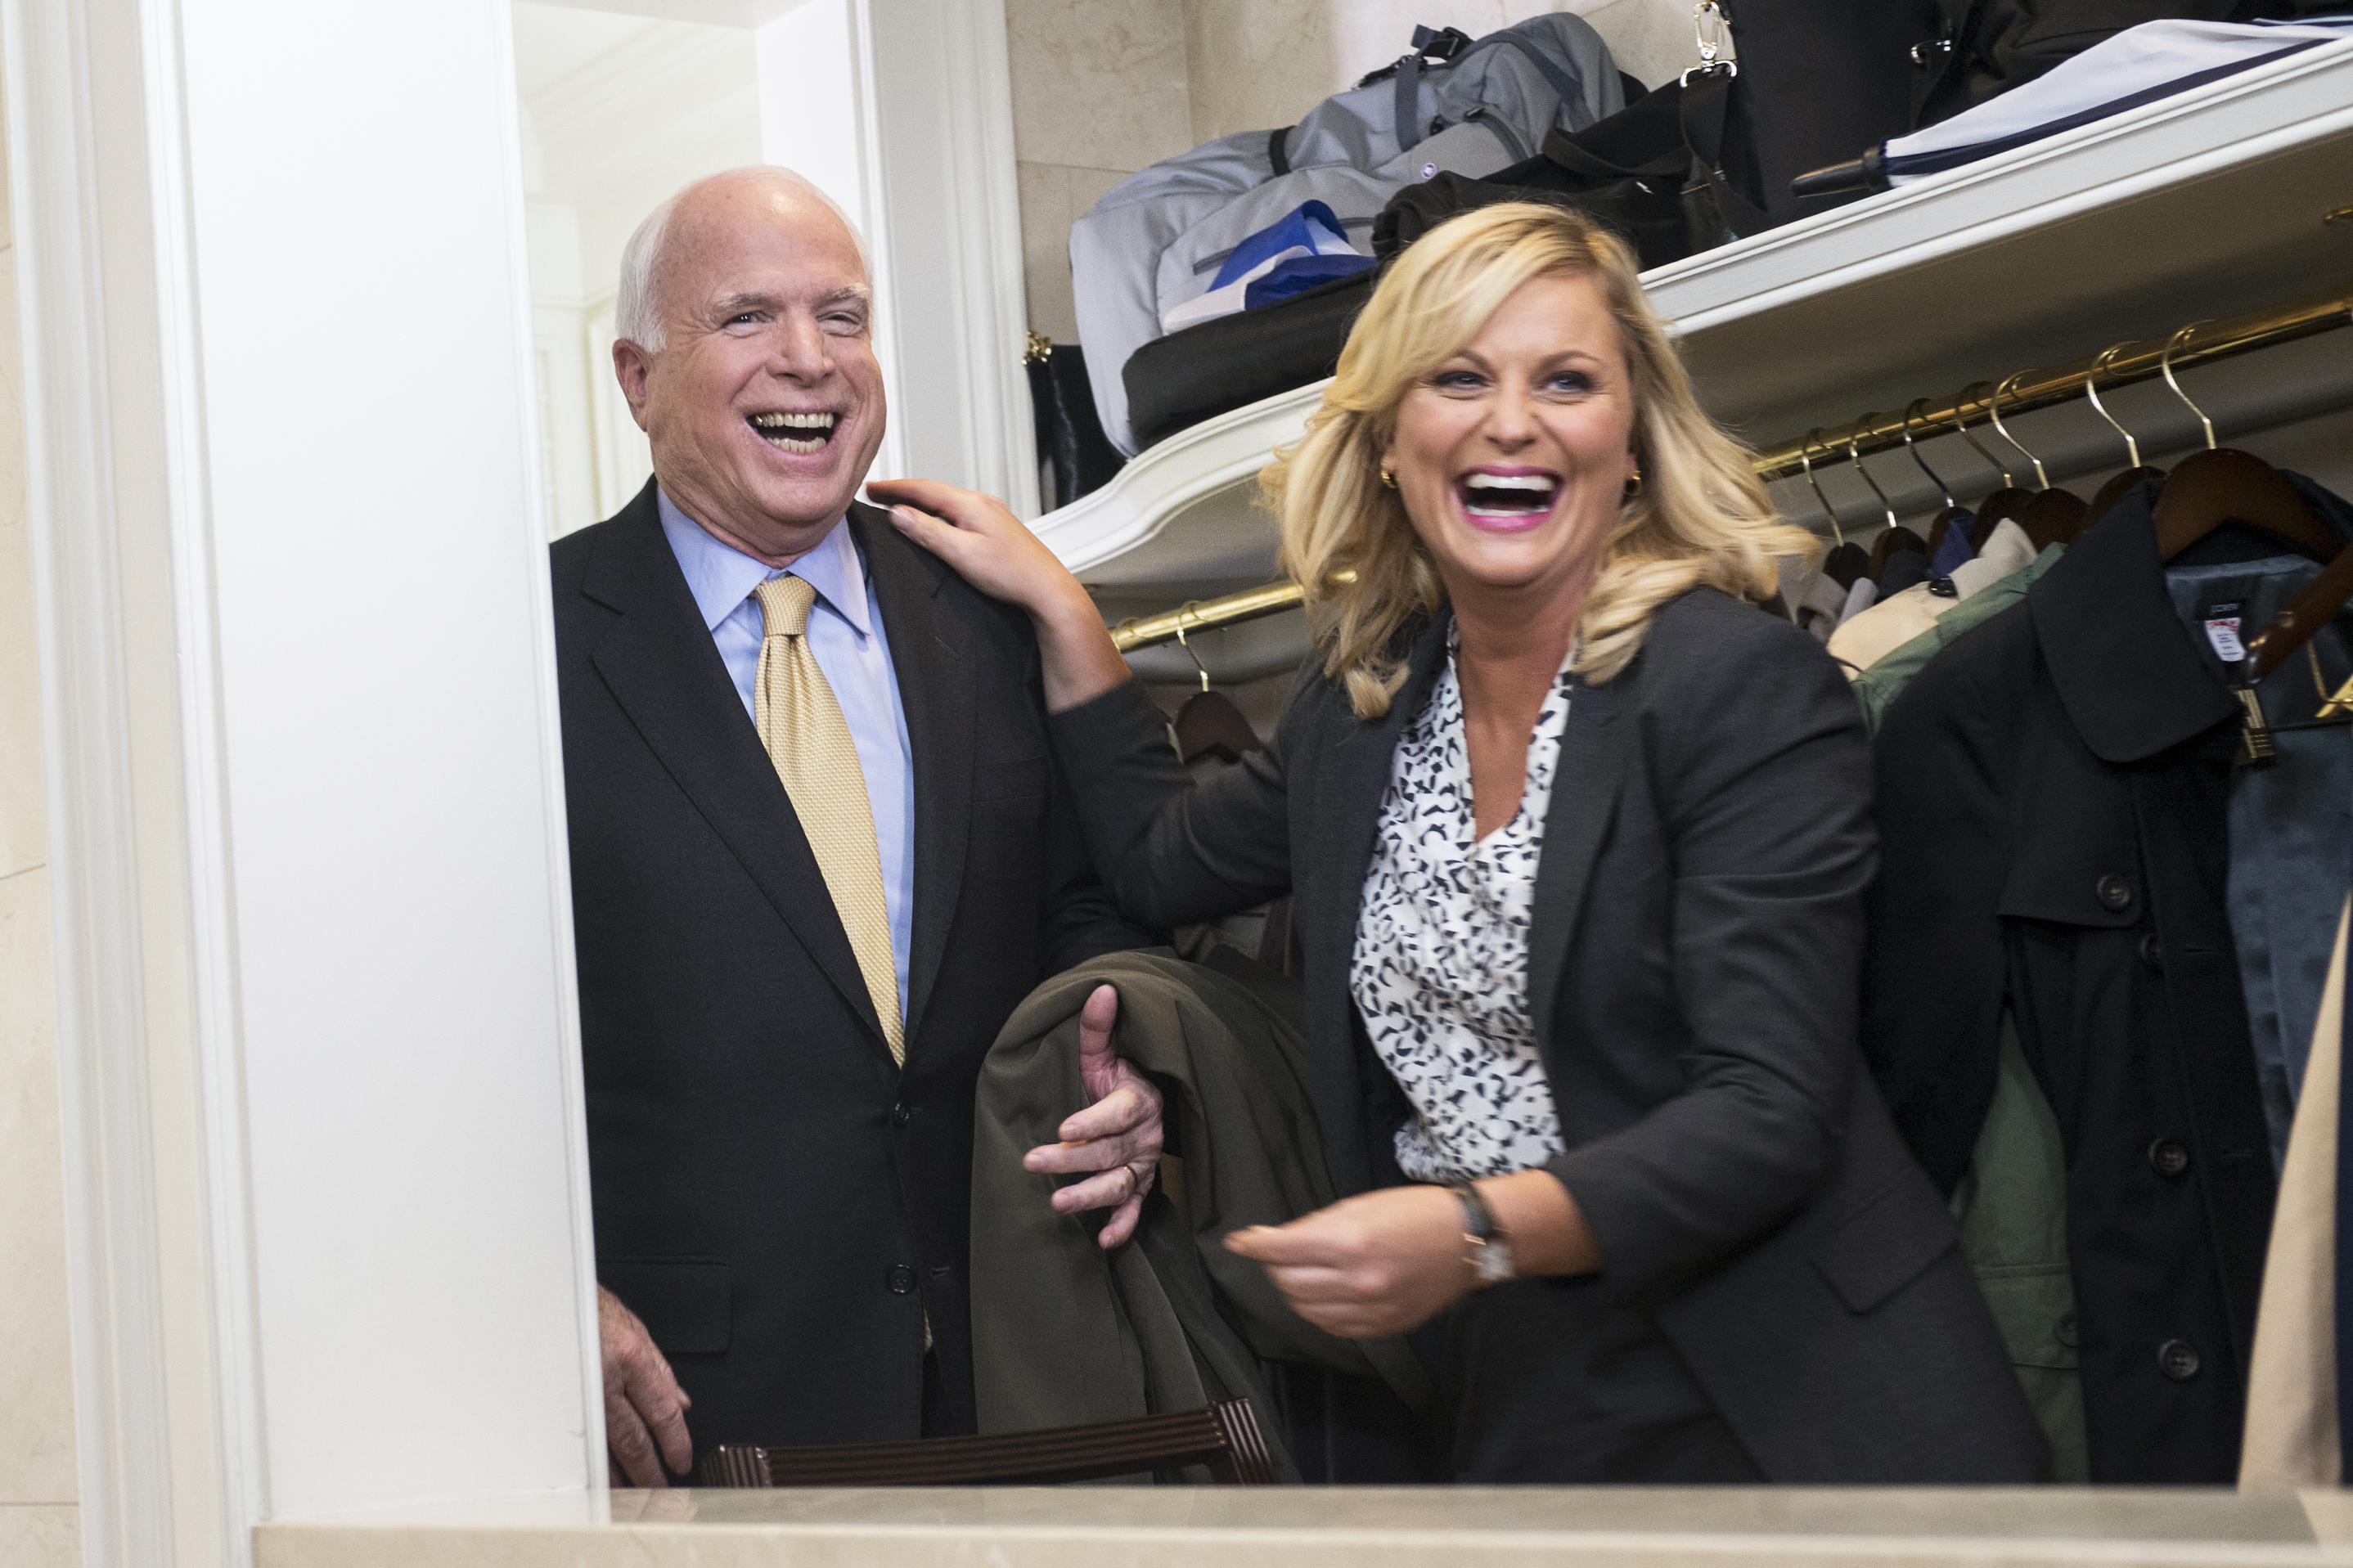 Senator John McCain and Amy Poehler on Parks and Recreation, 2012.